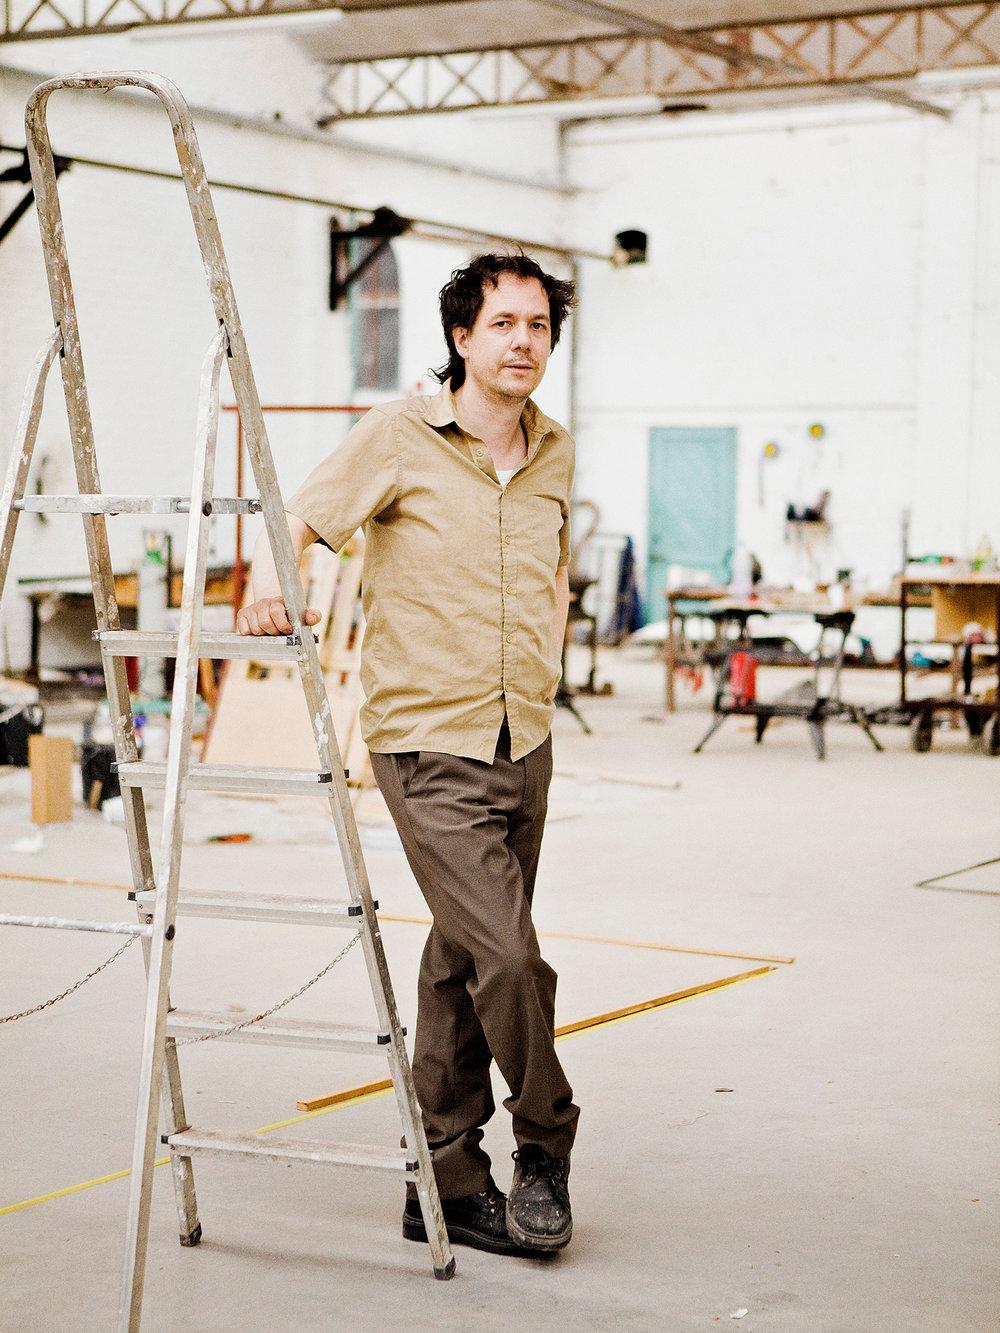 Mark Manders for Heineken Prizes.